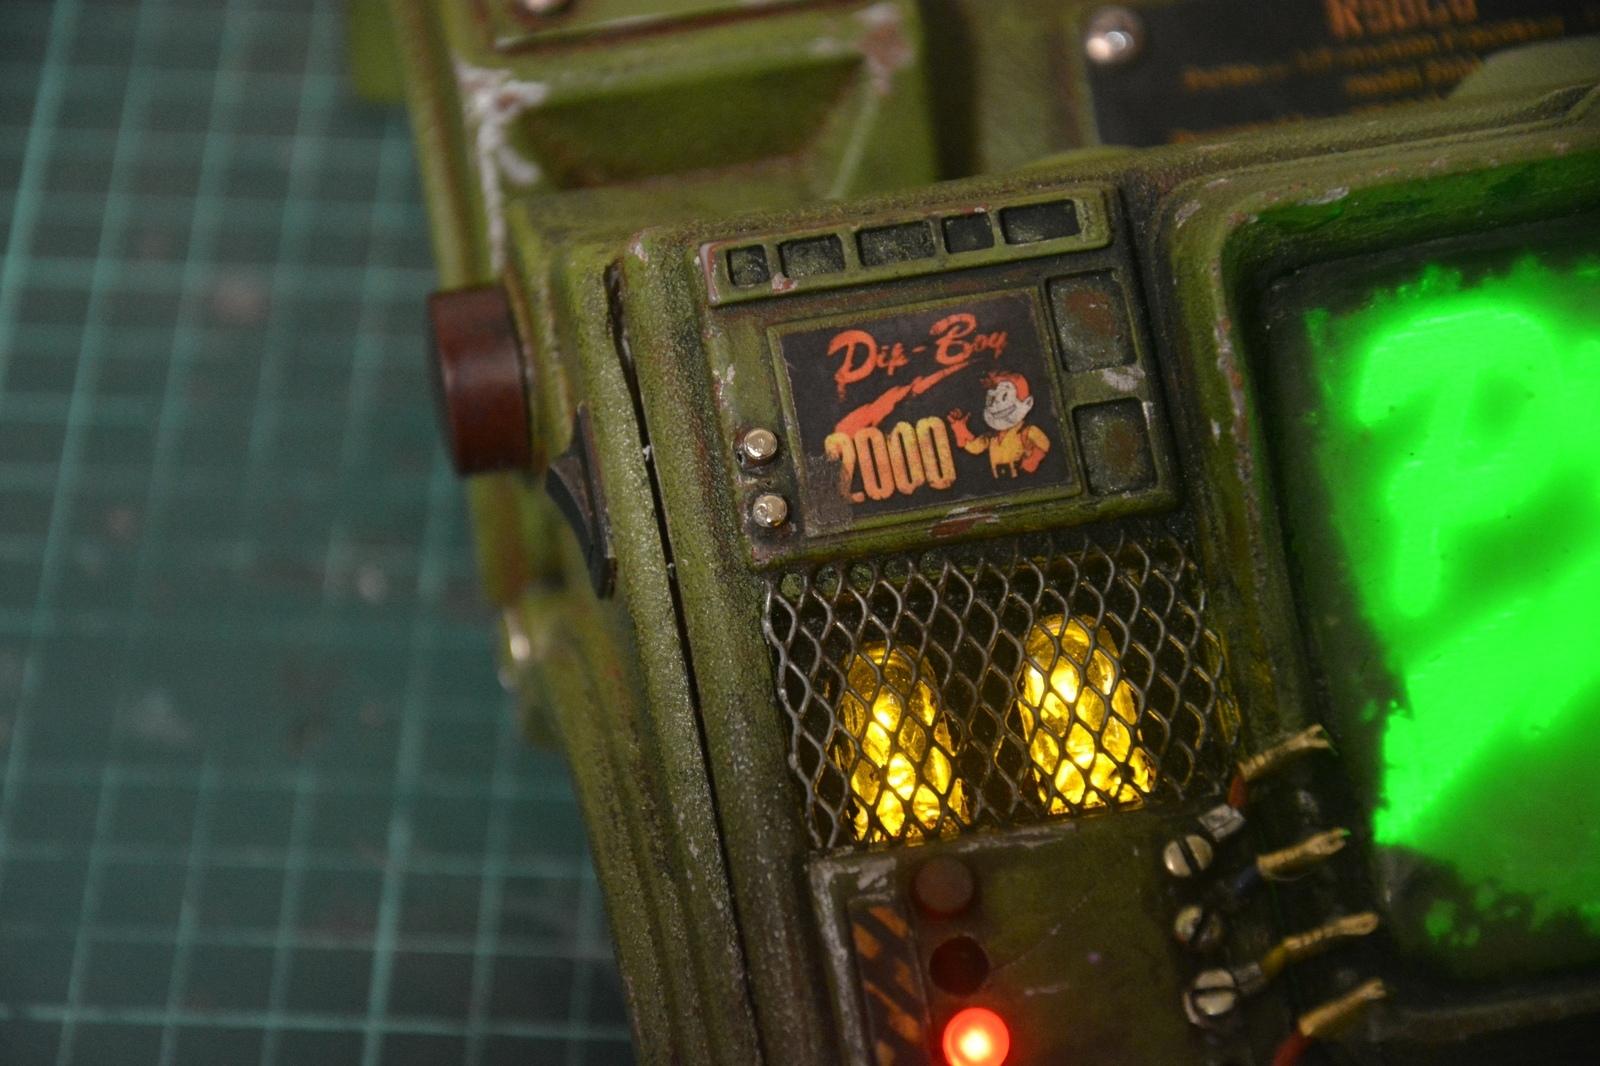 Pipboy 2000 из Fallout своими руками